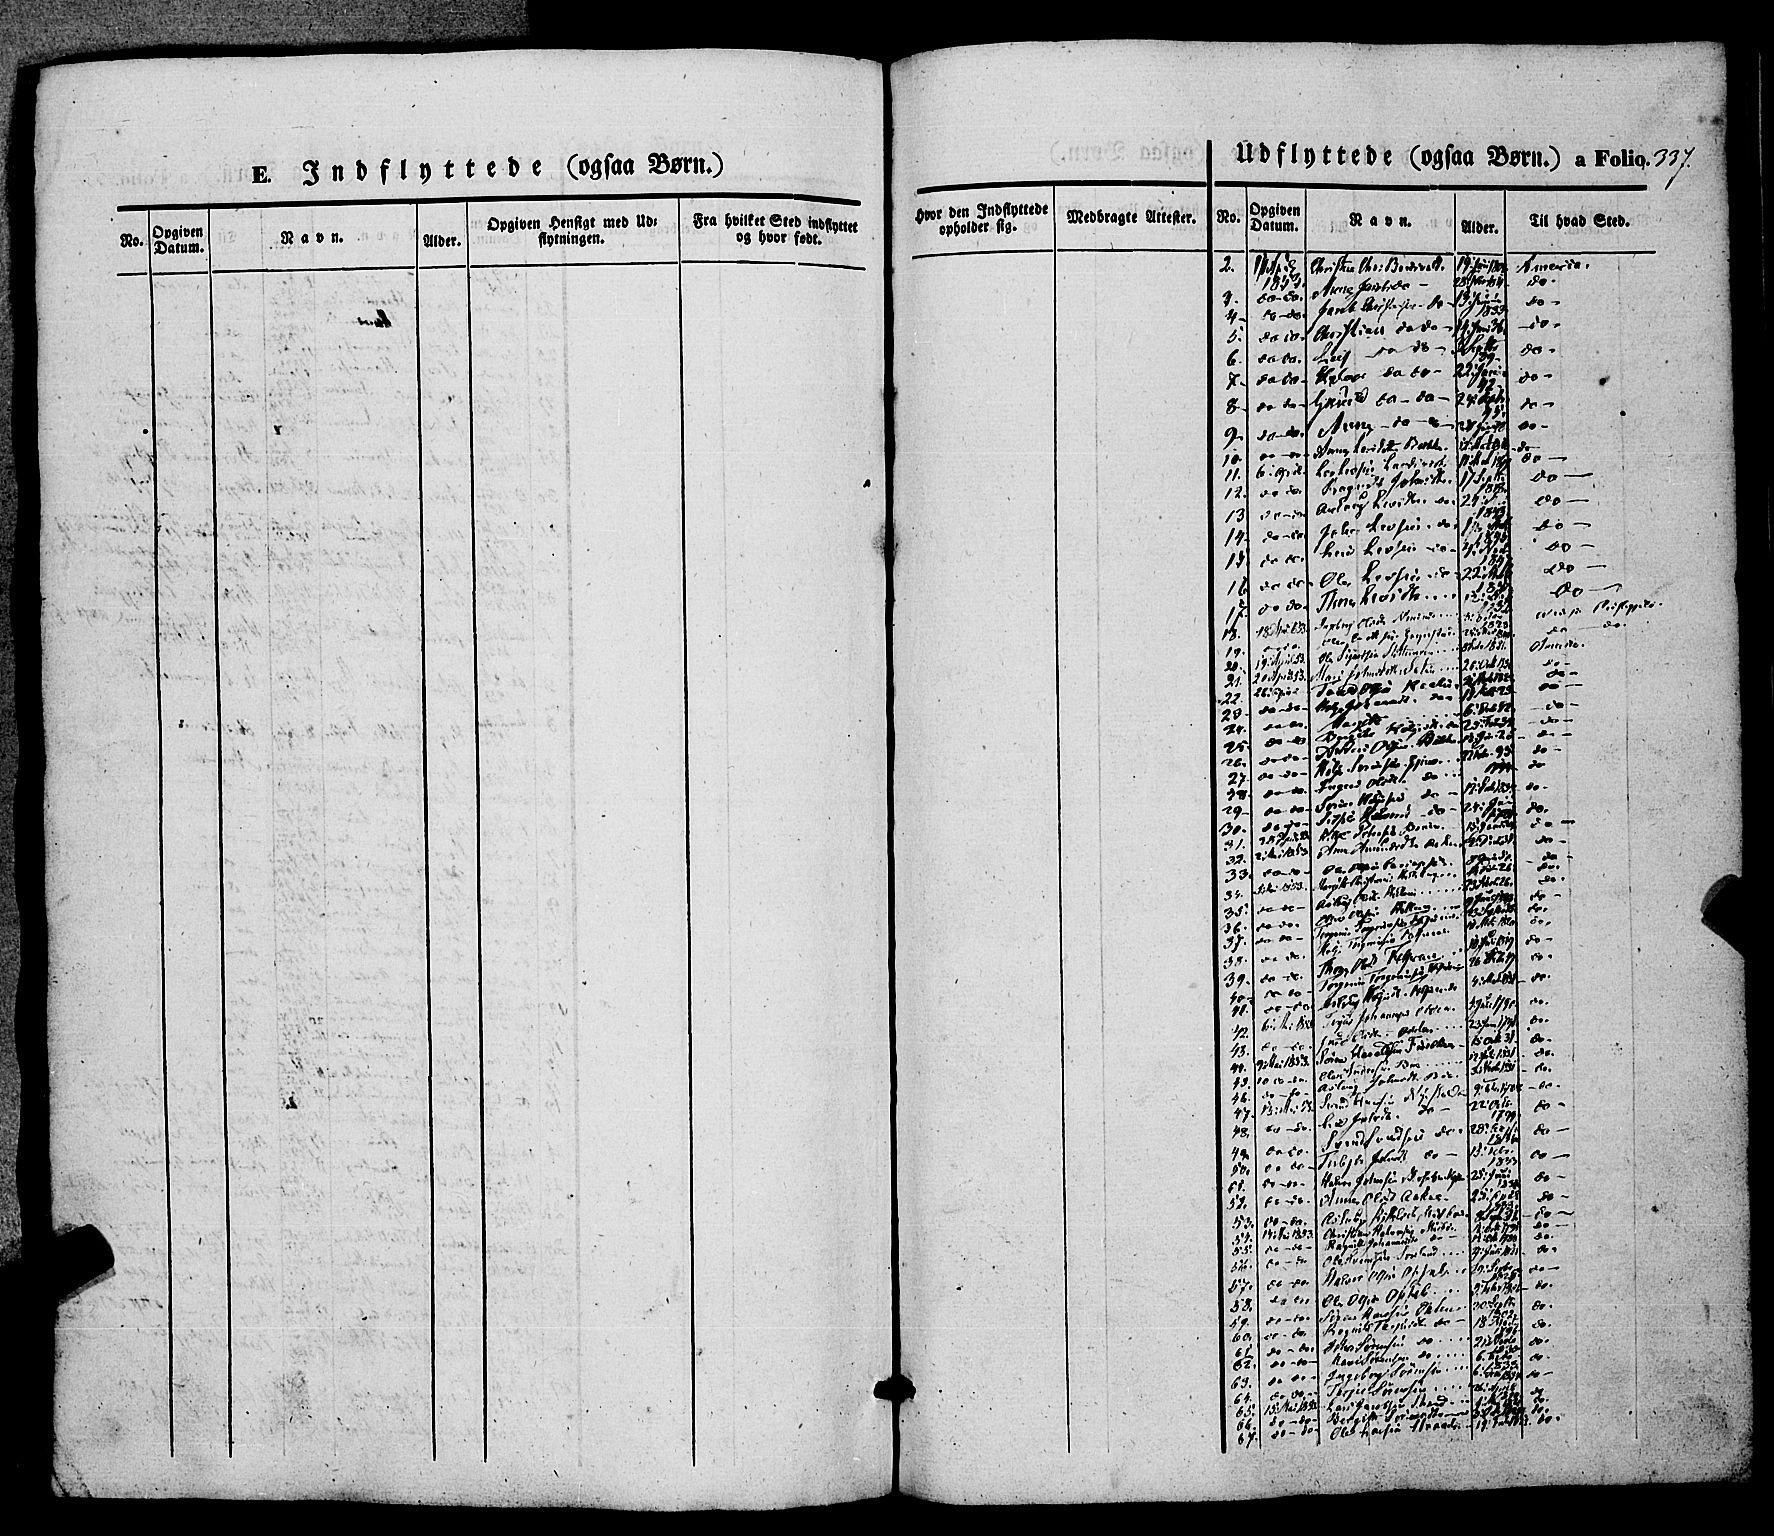 SAKO, Hjartdal kirkebøker, F/Fa/L0008: Ministerialbok nr. I 8, 1844-1859, s. 337